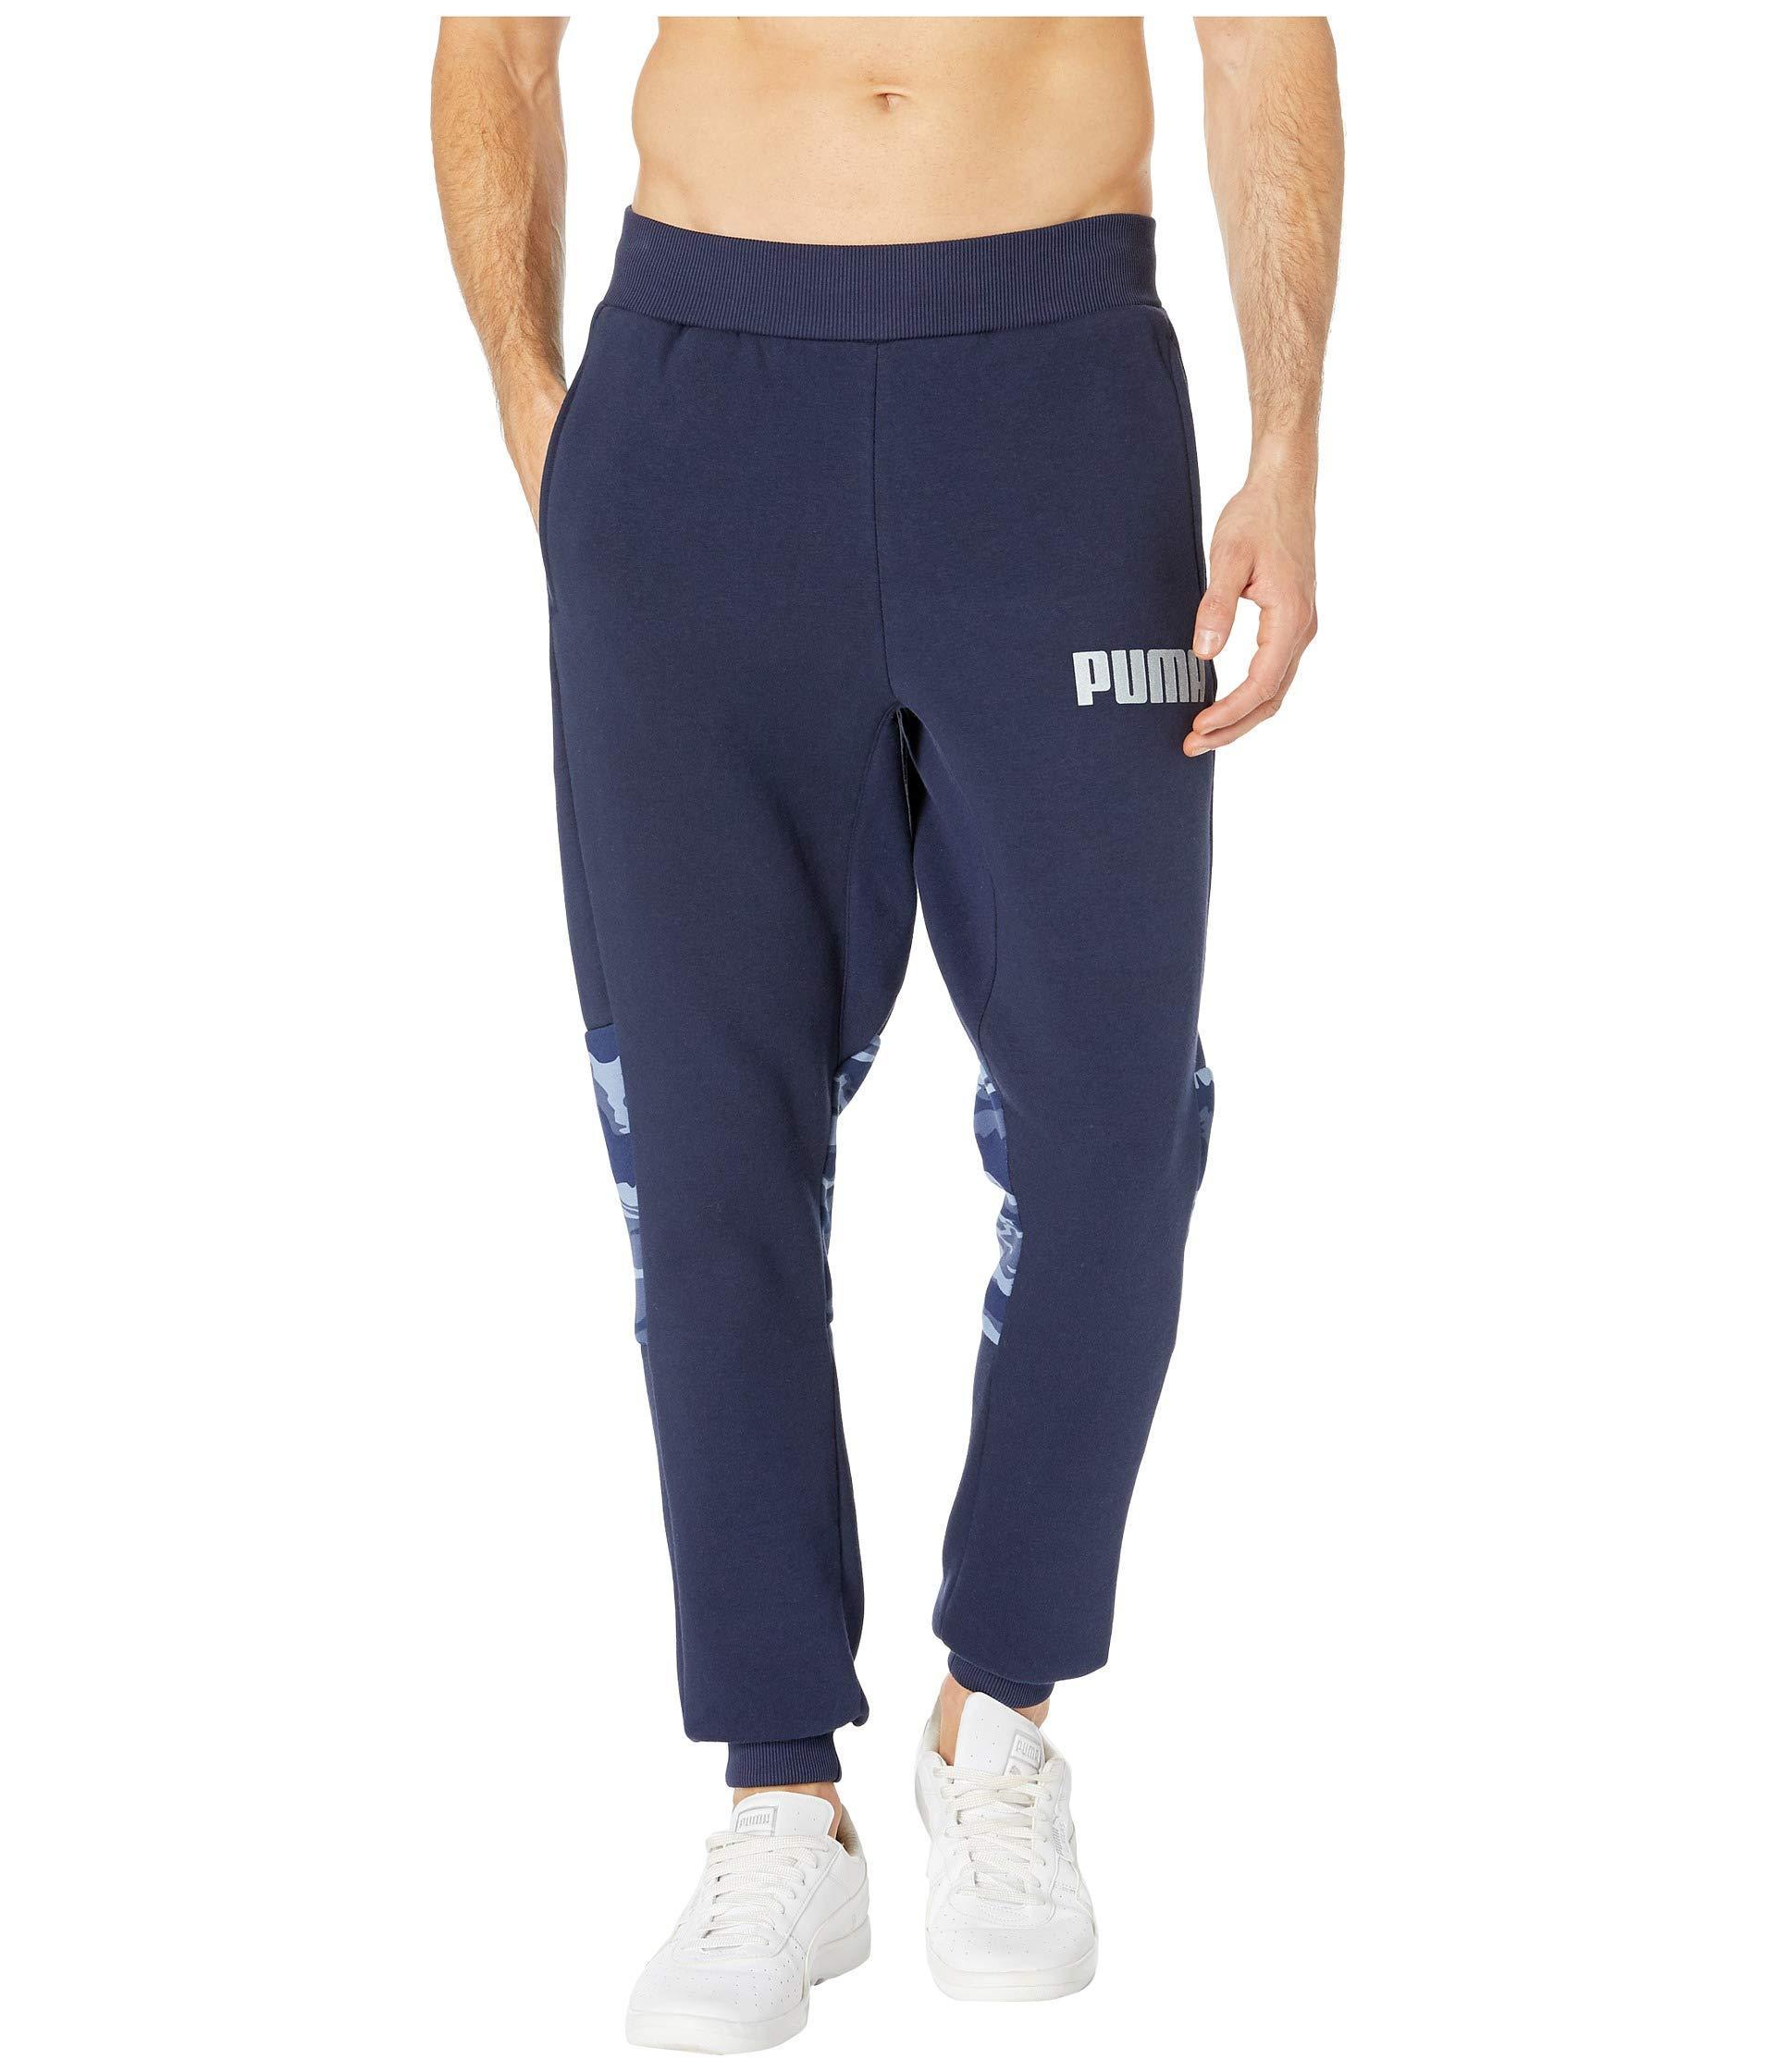 497b66096cad Lyst - PUMA Camo Foil Fleece Sweatpants in Blue for Men - Save 6%